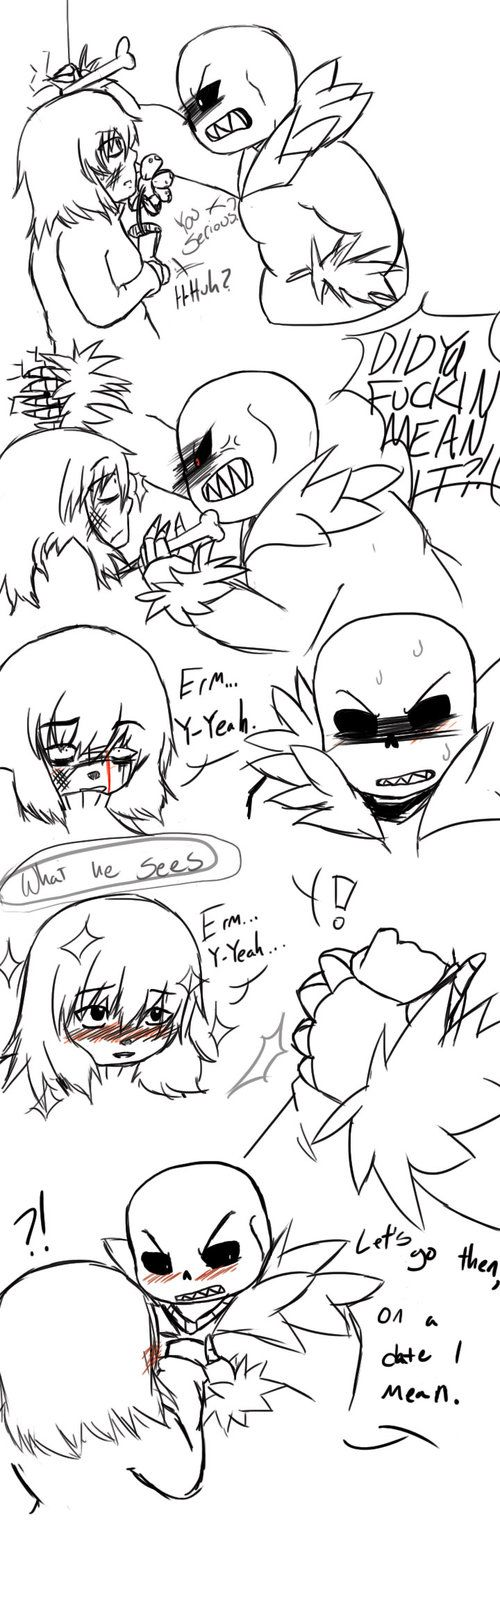 UnderfellSans x OlderFrisk Comic Page 3 by ParodyPunk on DeviantArt